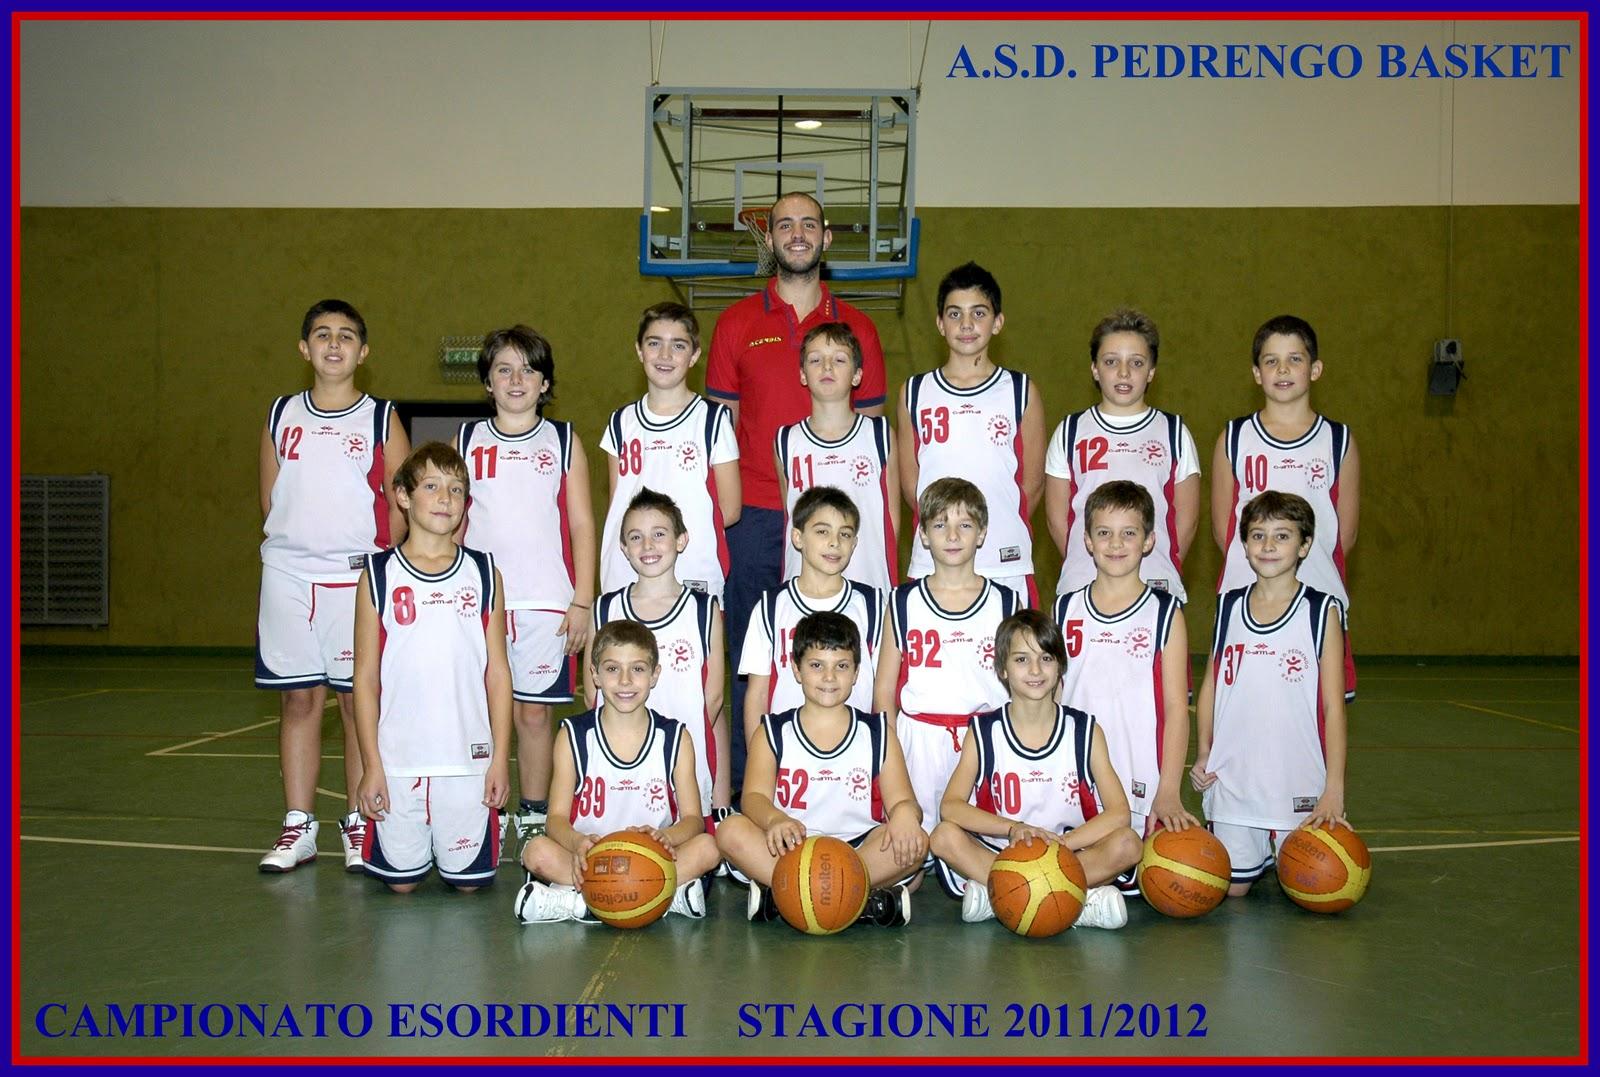 A s d pedrengo basket foto di squadra - Squadra per piastrellisti ...